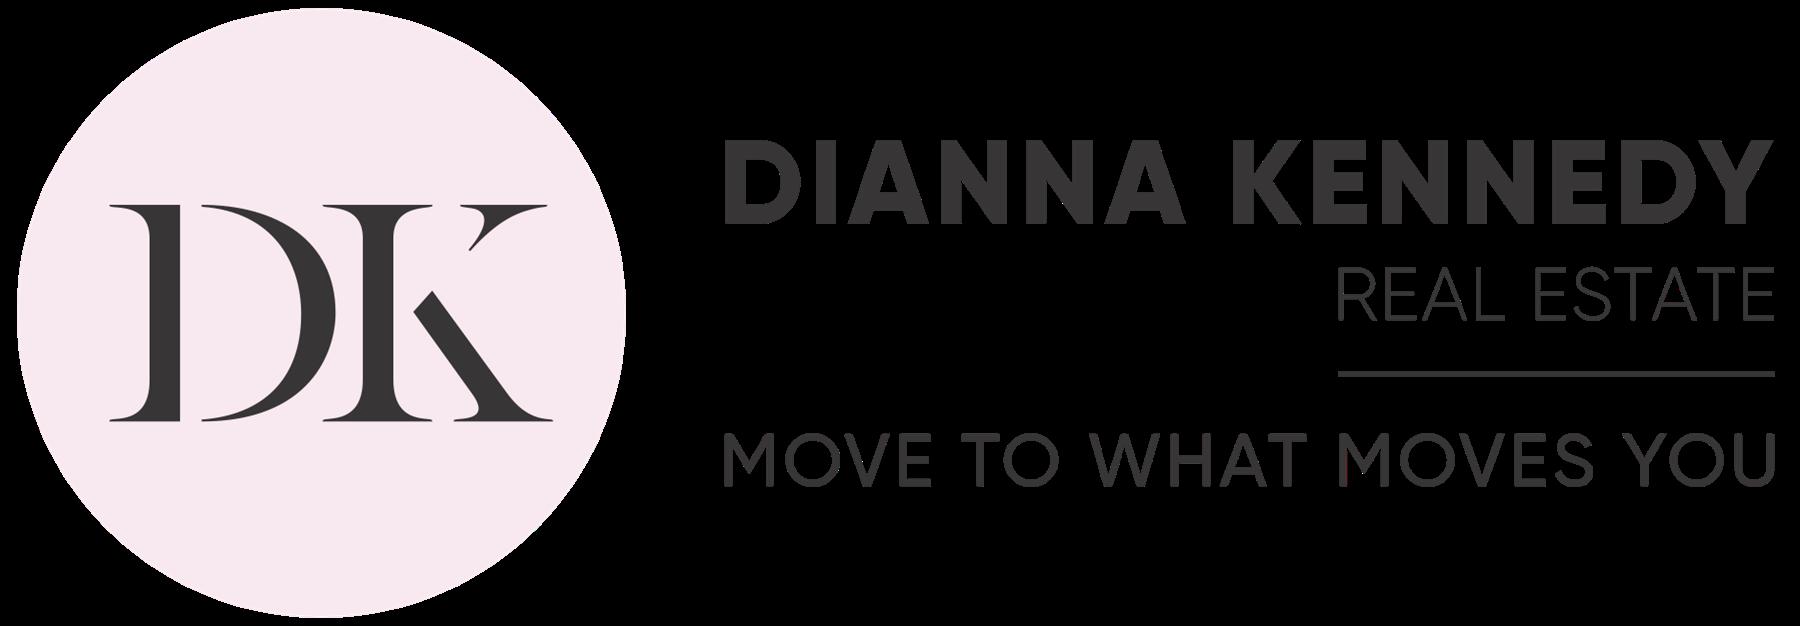 Dianna Kennedy